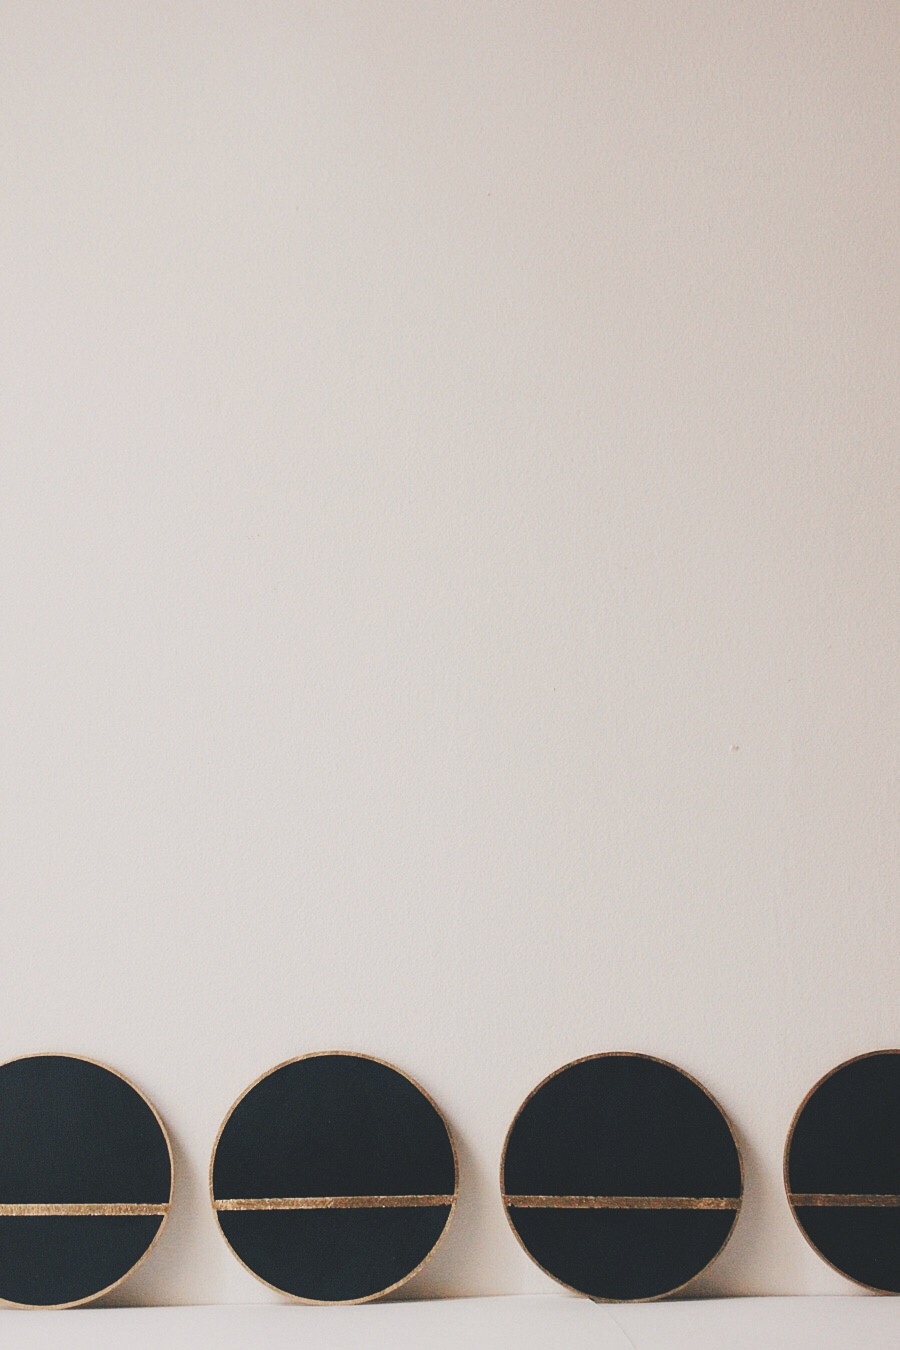 linea+coasters+black+the+vintage+vogue1.jpeg